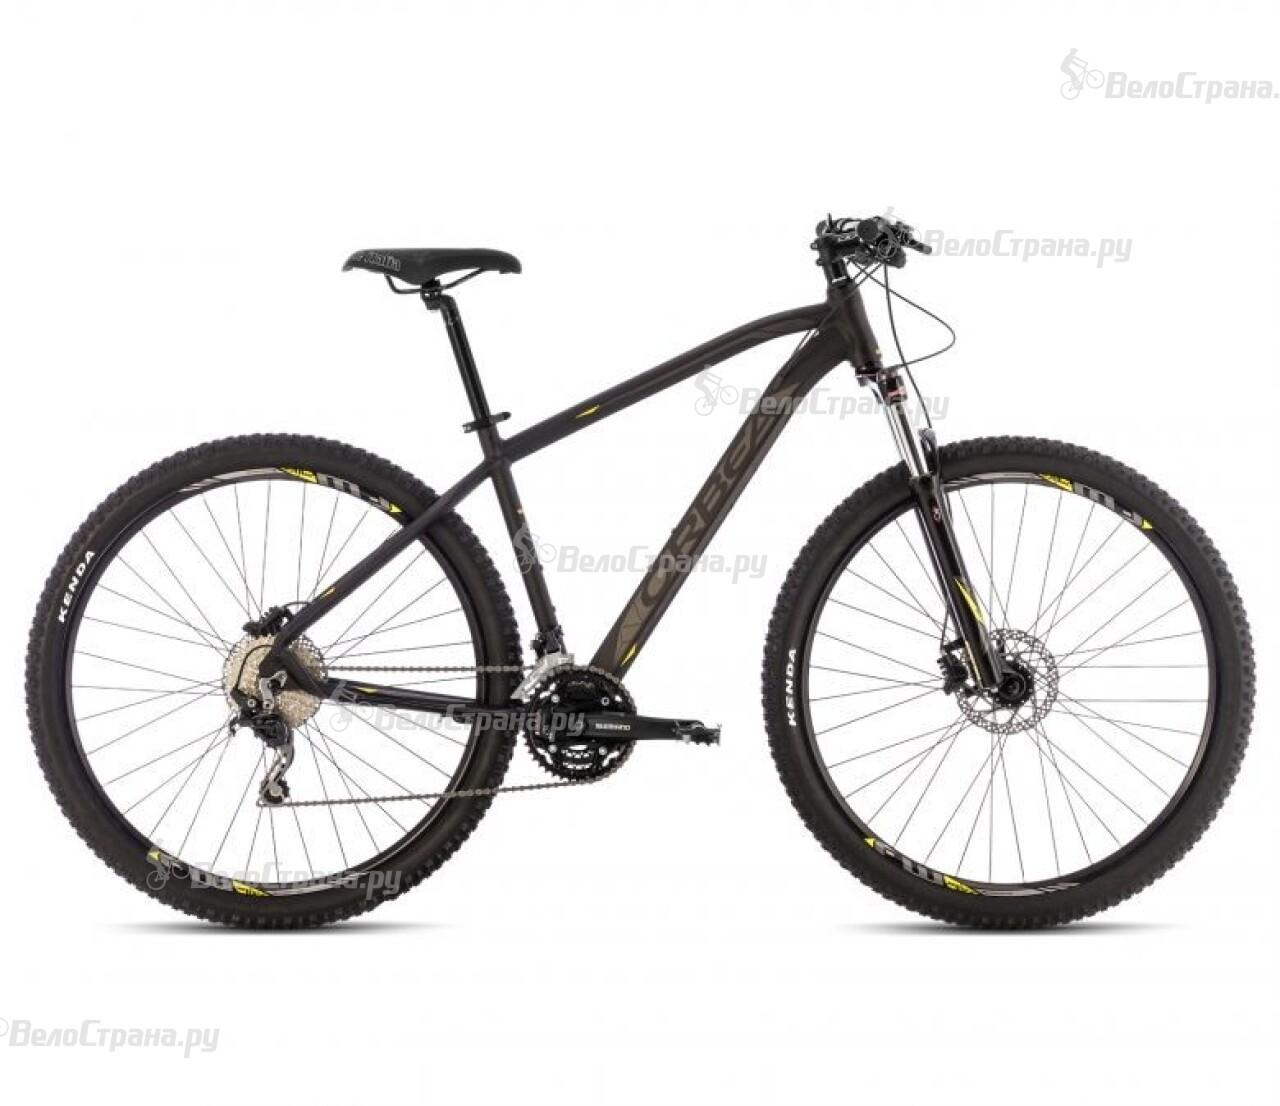 Велосипед Orbea Mx 29 10 Dama (2014) велосипед orbea mx 24 xc 2014